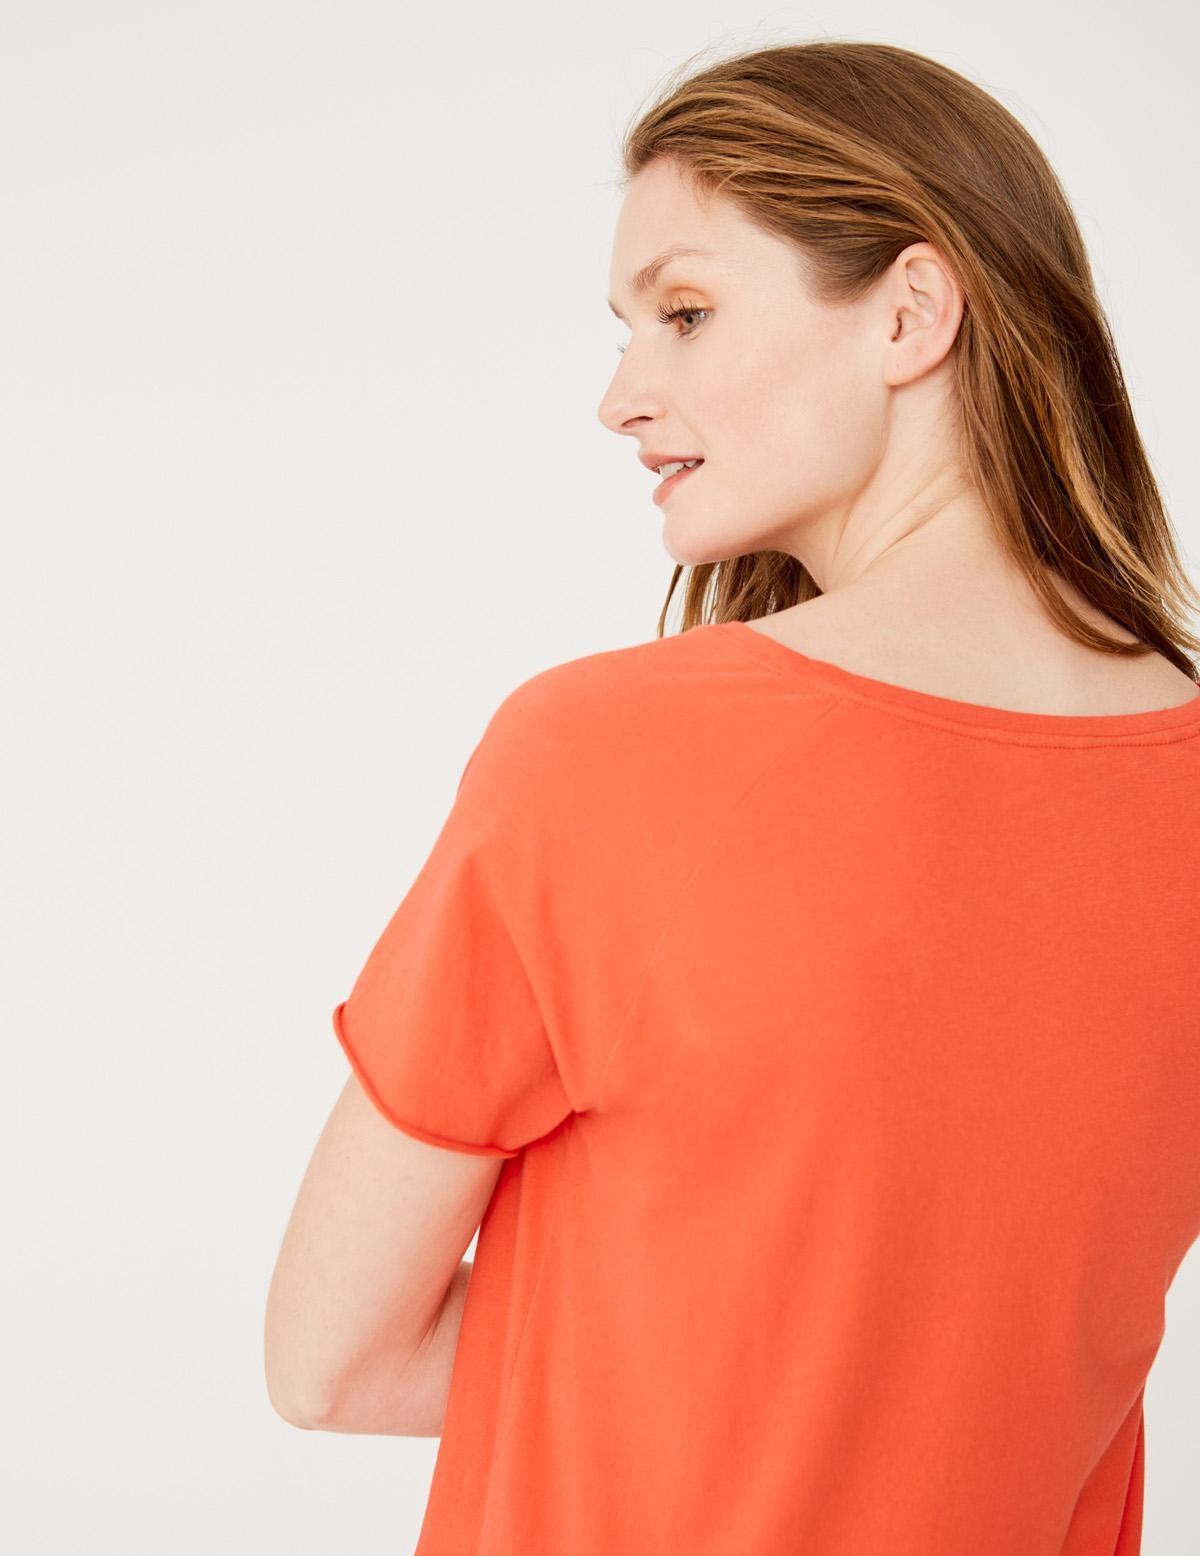 Camiseta algodón orgánico - Ítem2